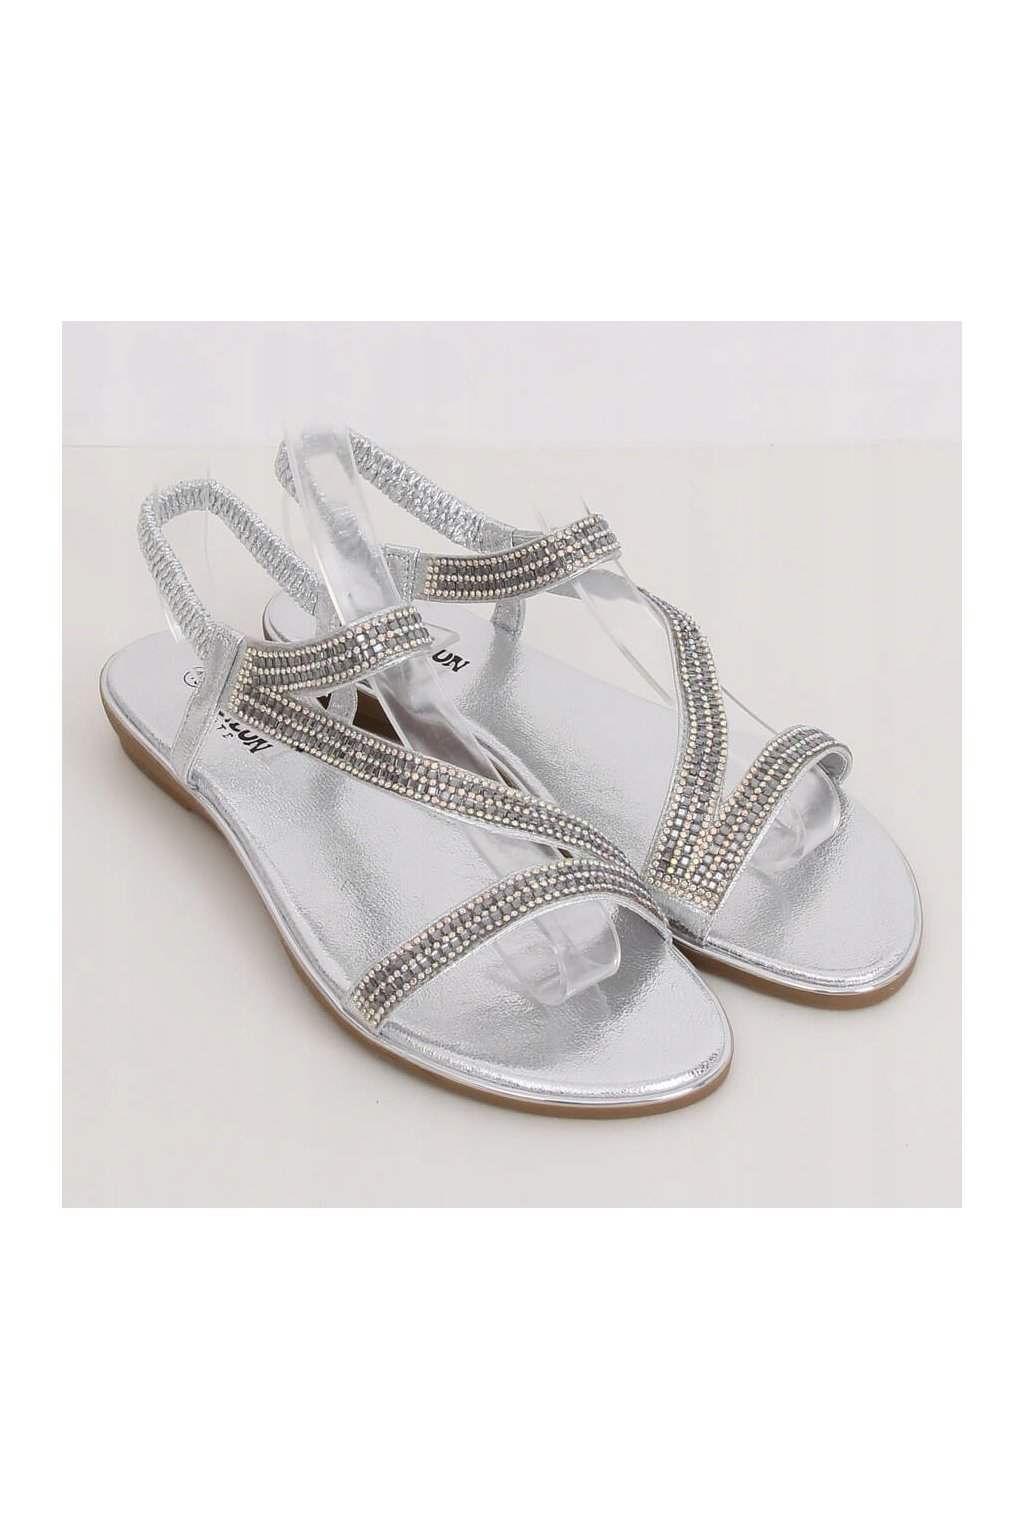 silver asymmetrical sandals km 33 silver grey 1 2000x2000